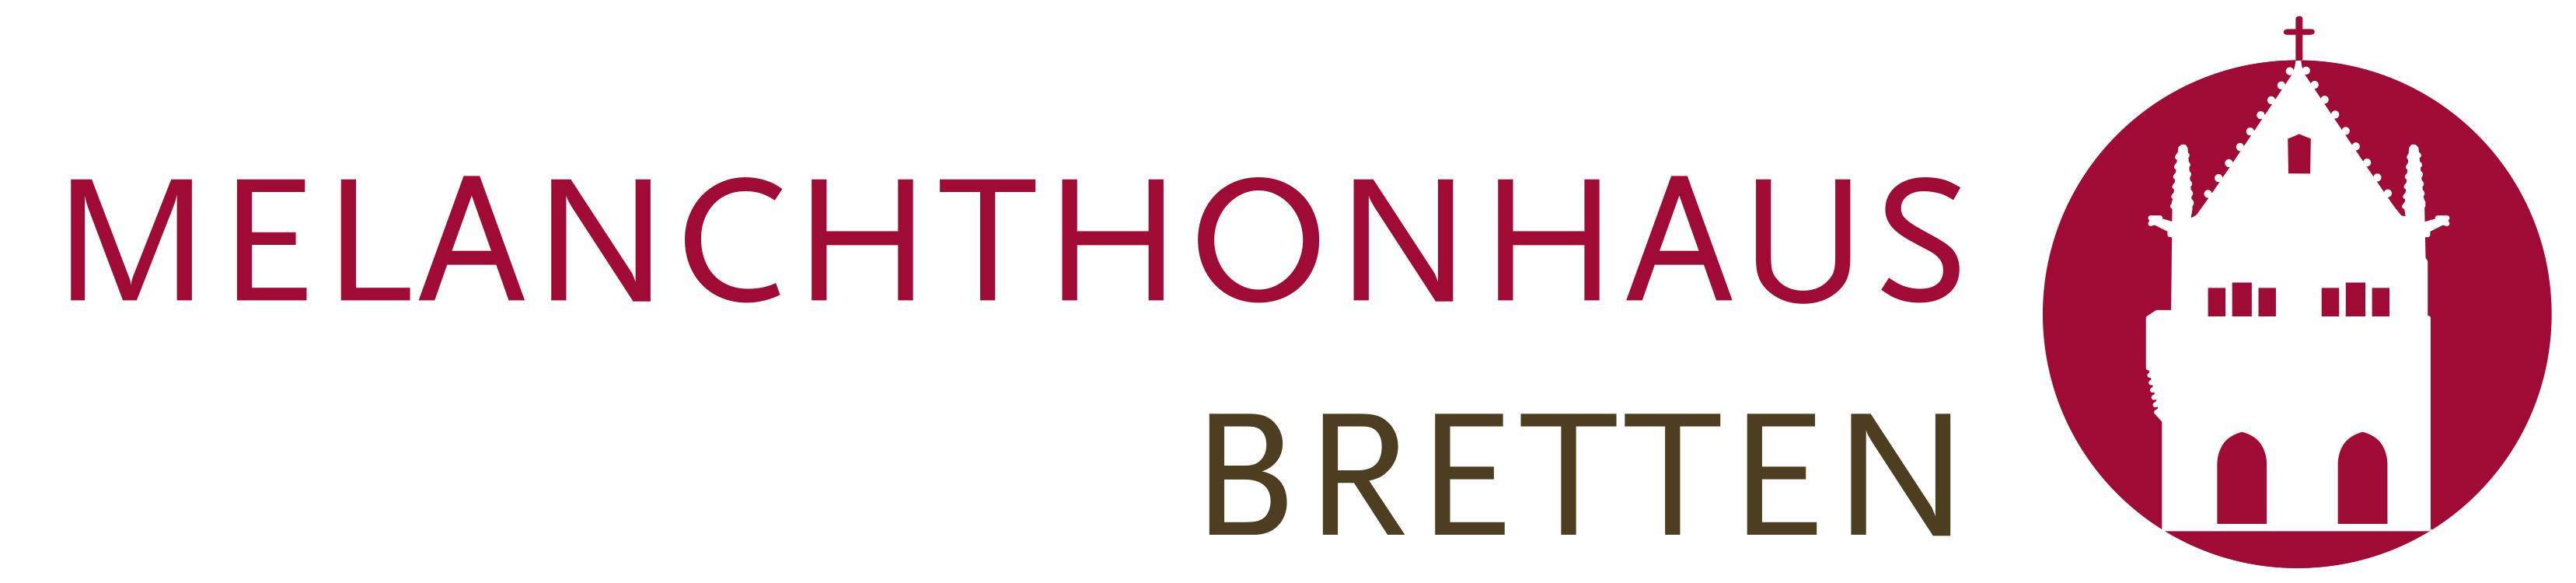 1407_Melanchthonhaus_Bretten_Logo